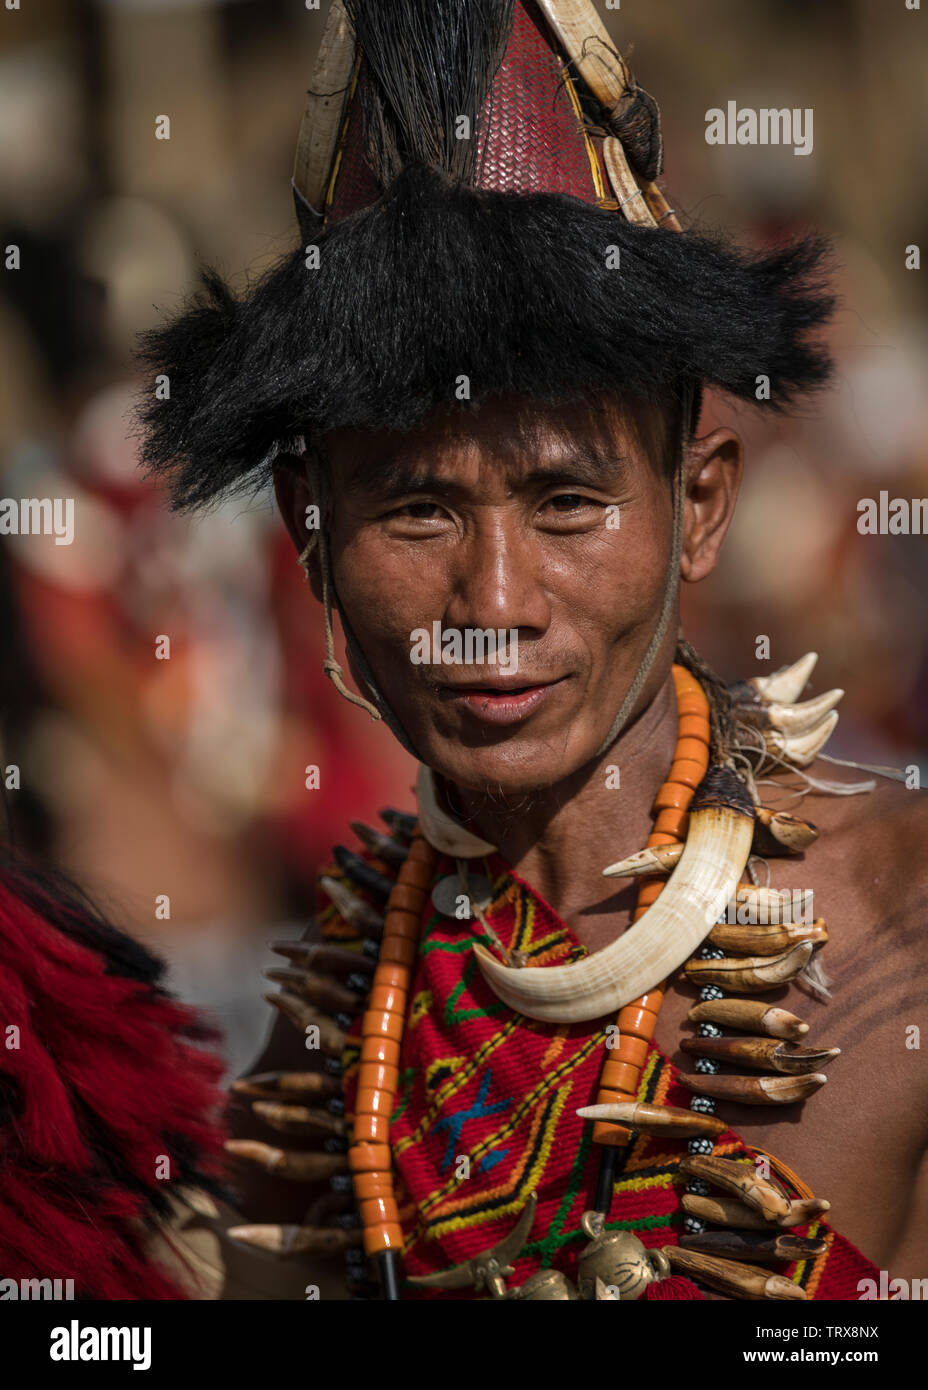 afa01c6086 Tribal Headgear Stock Photos & Tribal Headgear Stock Images - Alamy